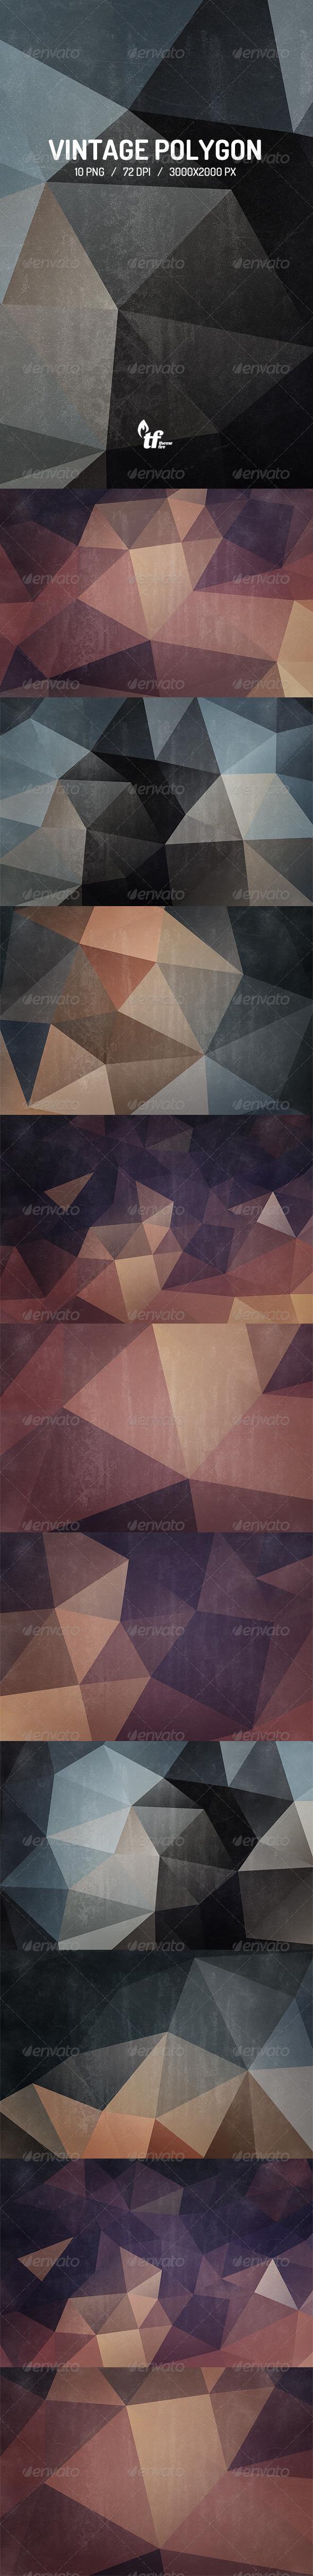 GraphicRiver Vintage Polygon Backgrounds 7295509